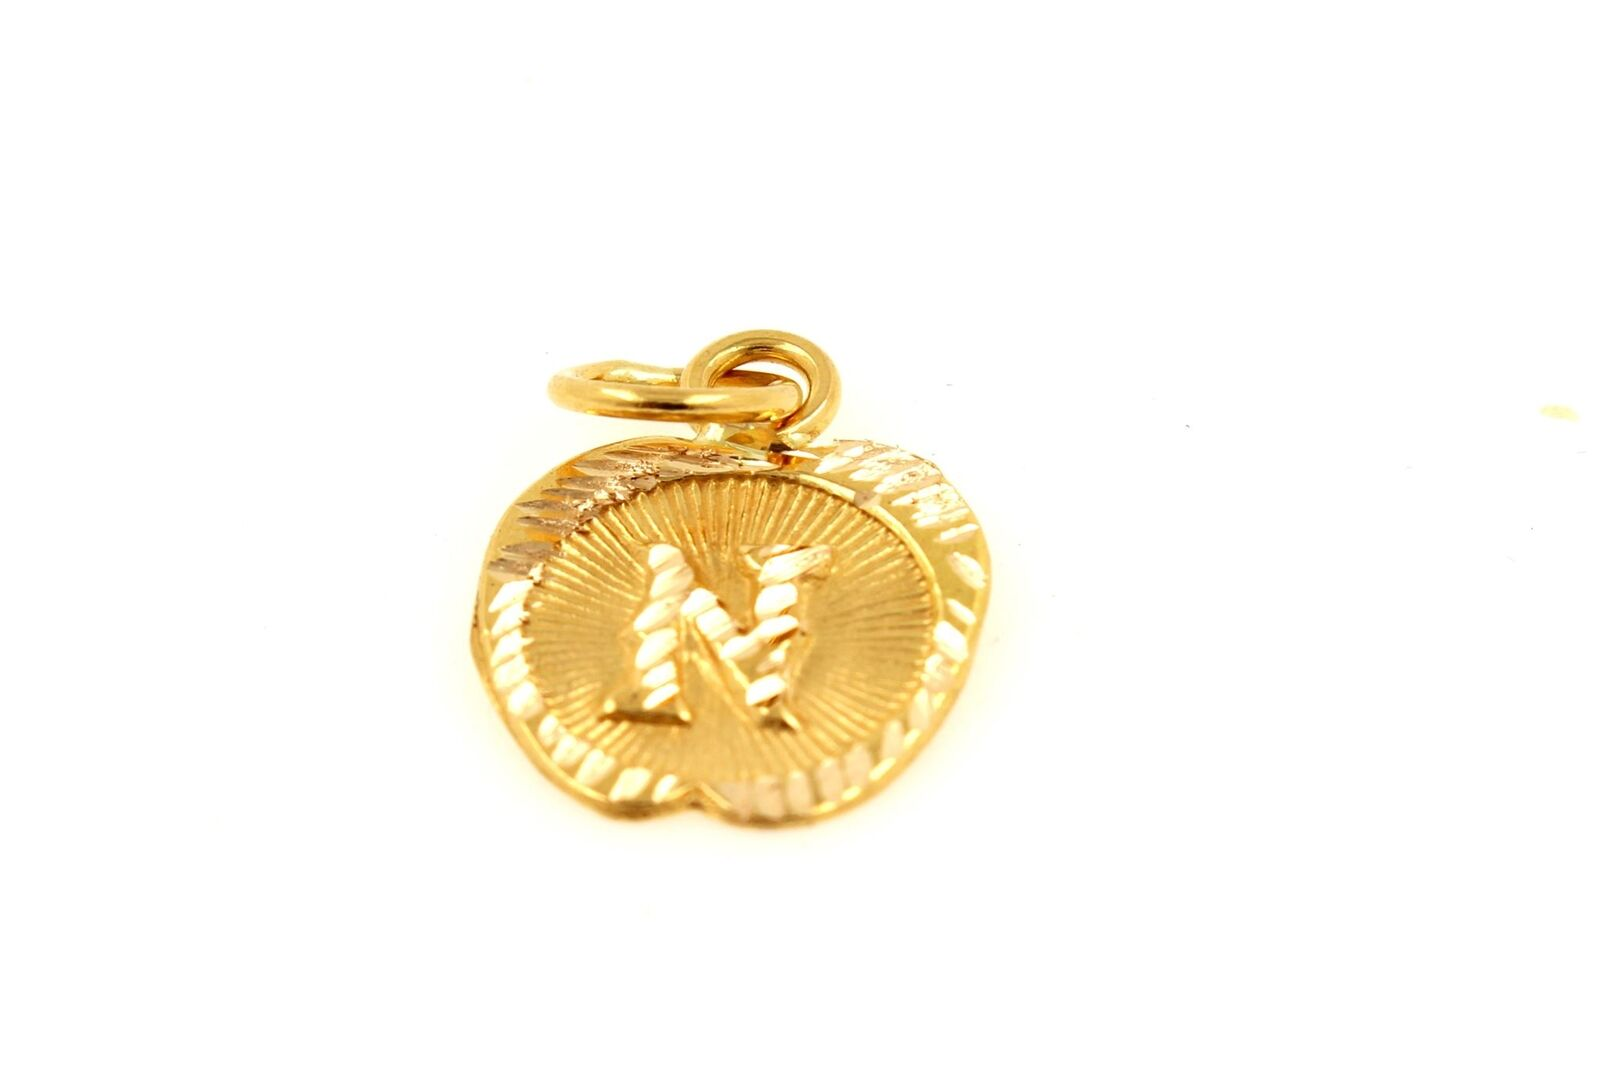 22k 22ct Solid gold Charm Letter N Pendant Apple Design p1217 ns